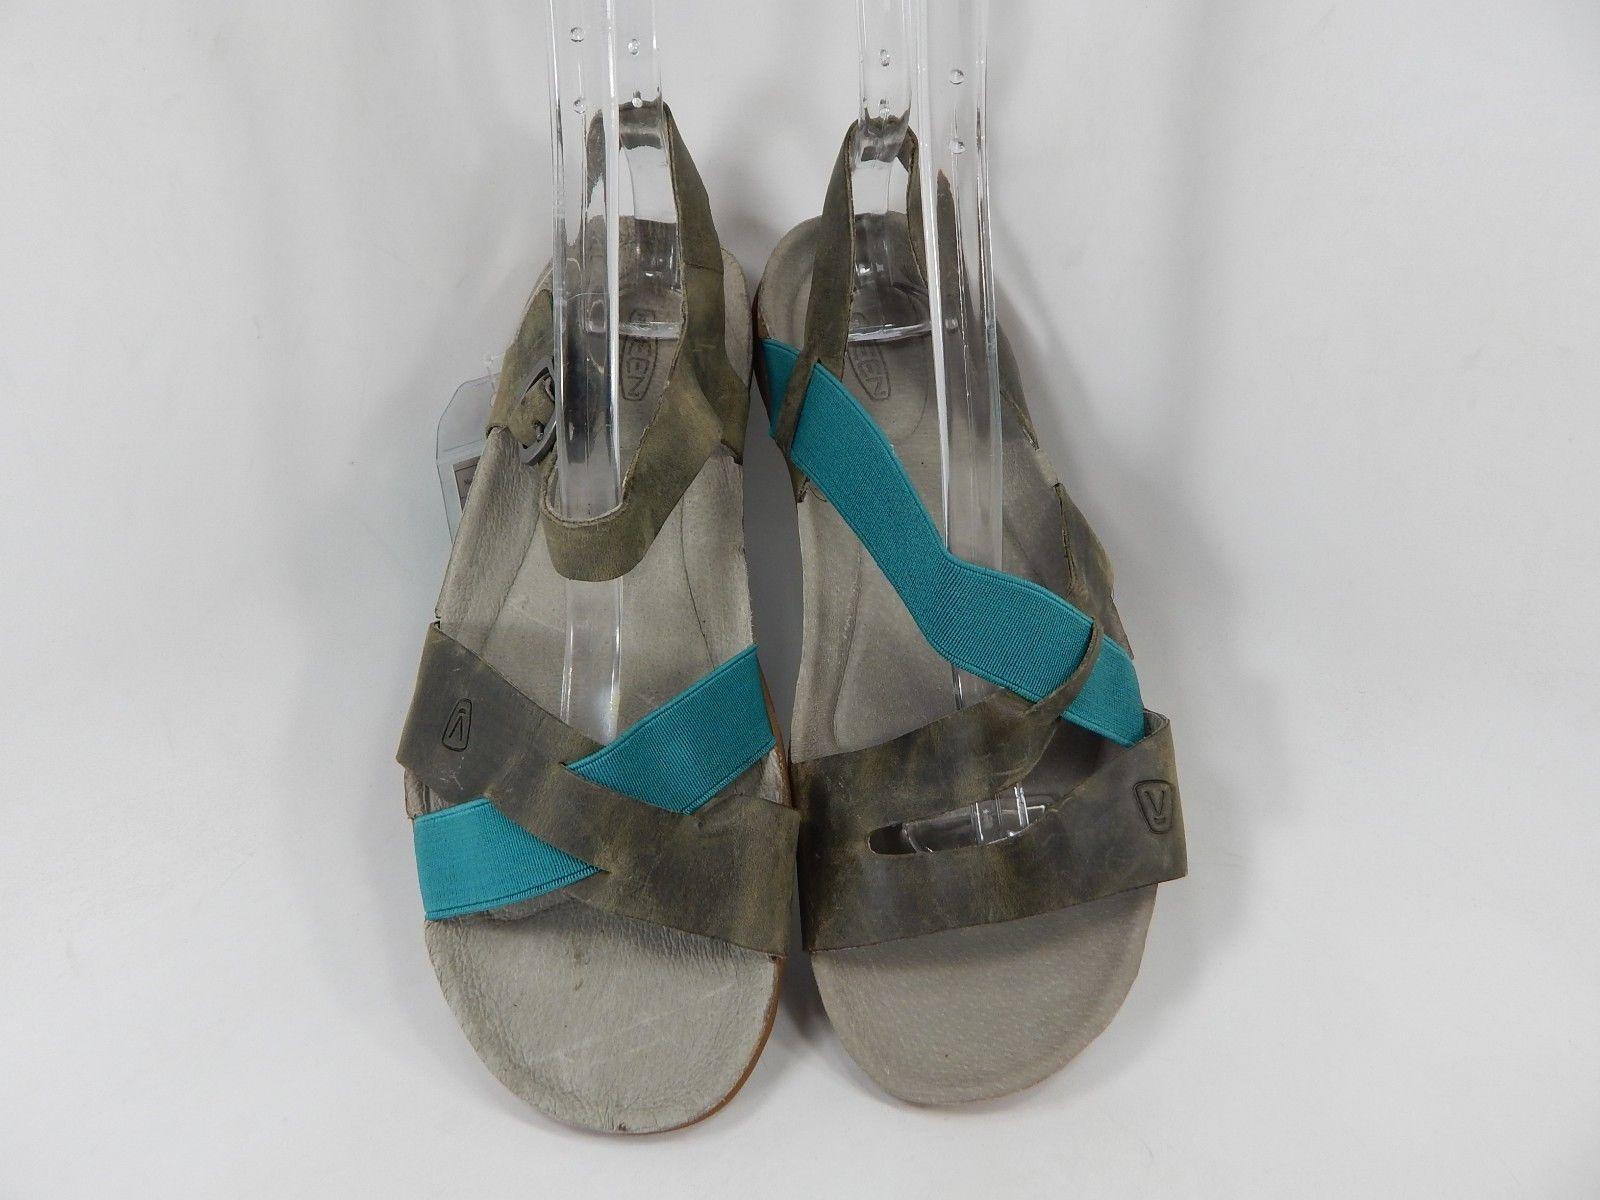 8660de293fa MISMATCH Keen Dauntless Strappy   Ankle Women s Sandals Size 7 M PLEASE  READ!